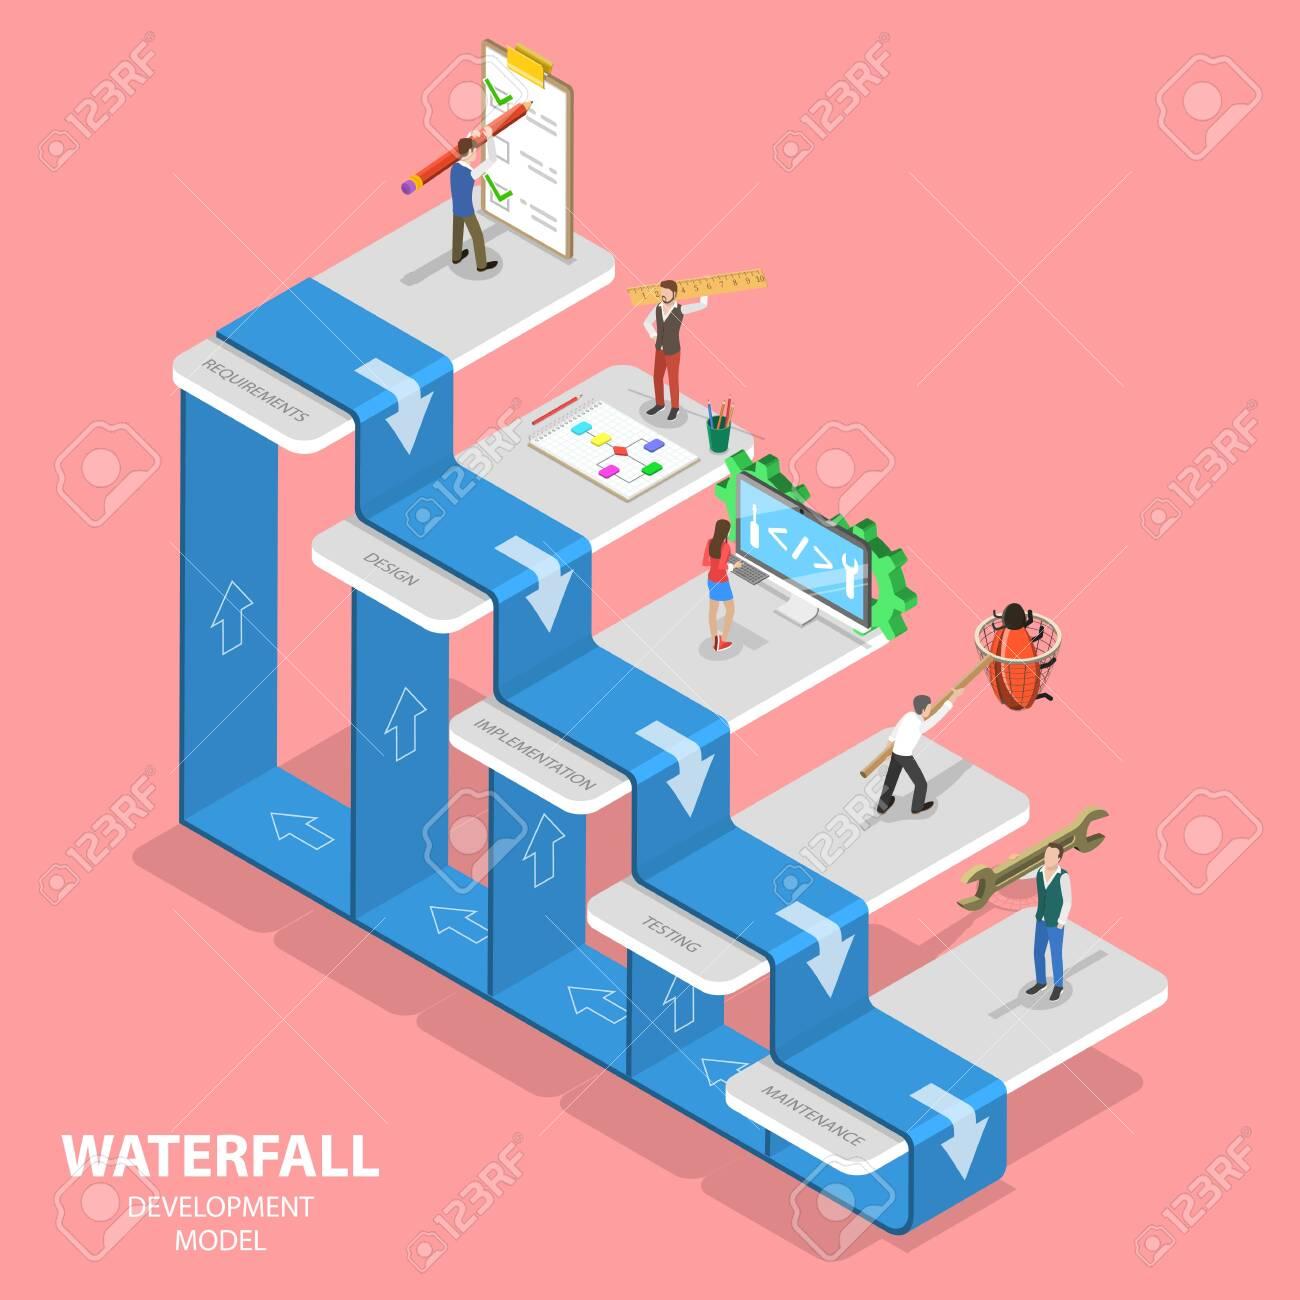 Flat isometric vector concept of waterfall methodology, software development. - 127670859